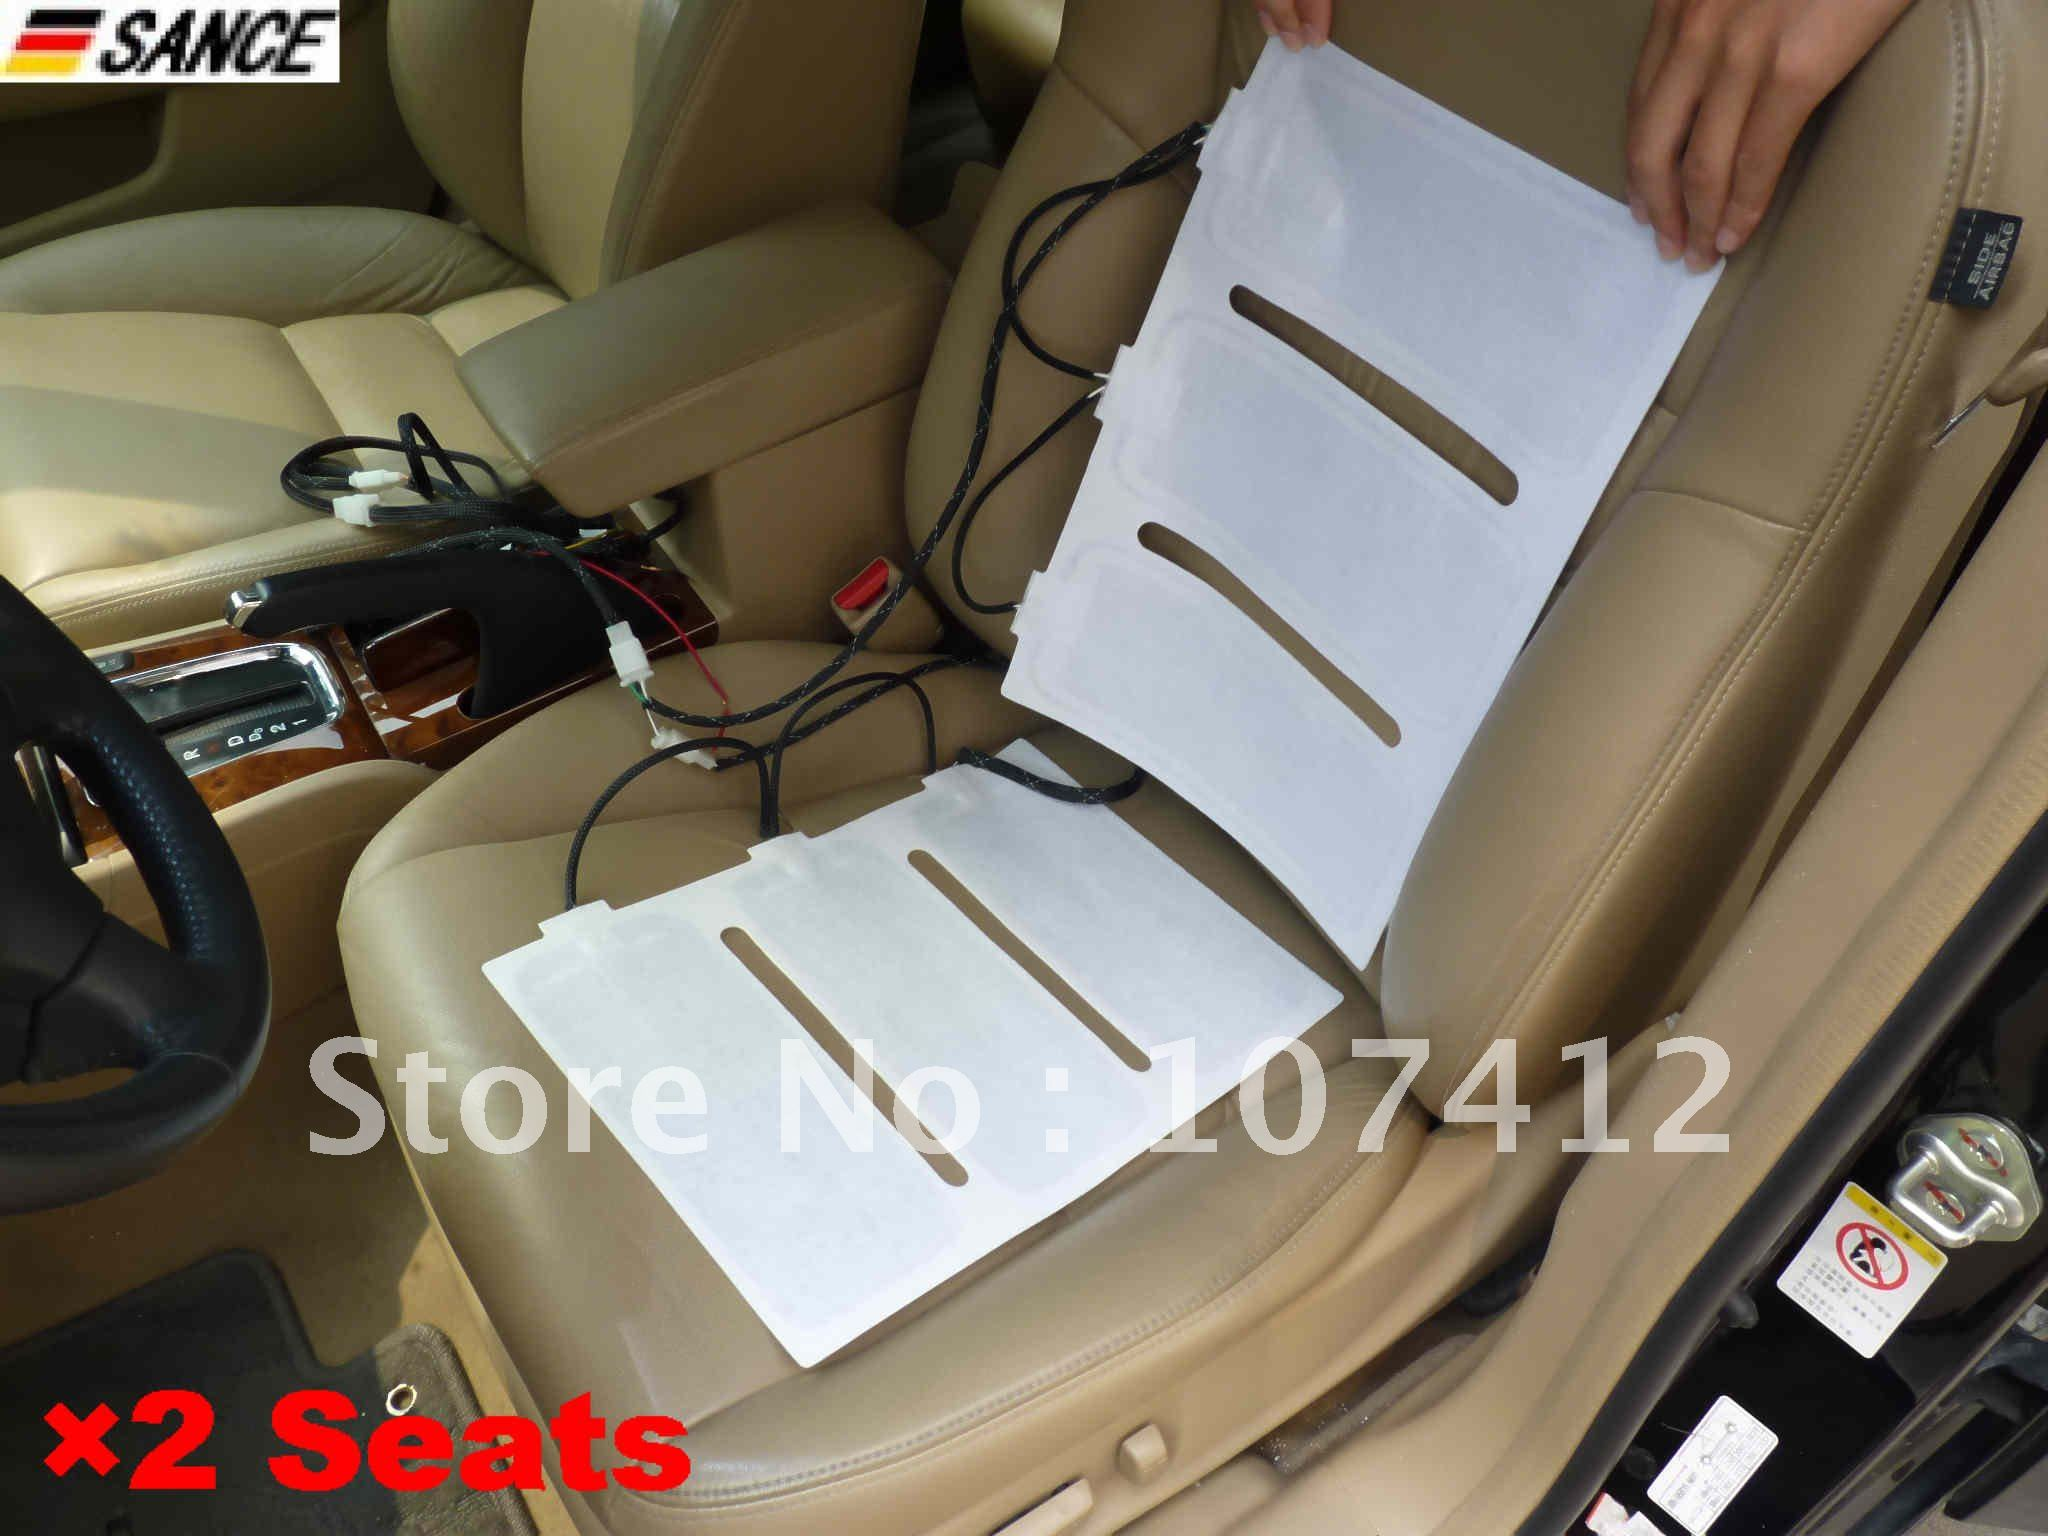 Free Shipping SH002 2 Seat Carbon Fiber Universal Heater Kit 4 Heating Pad 5 Gang Wholesale Retail On Aliexpress